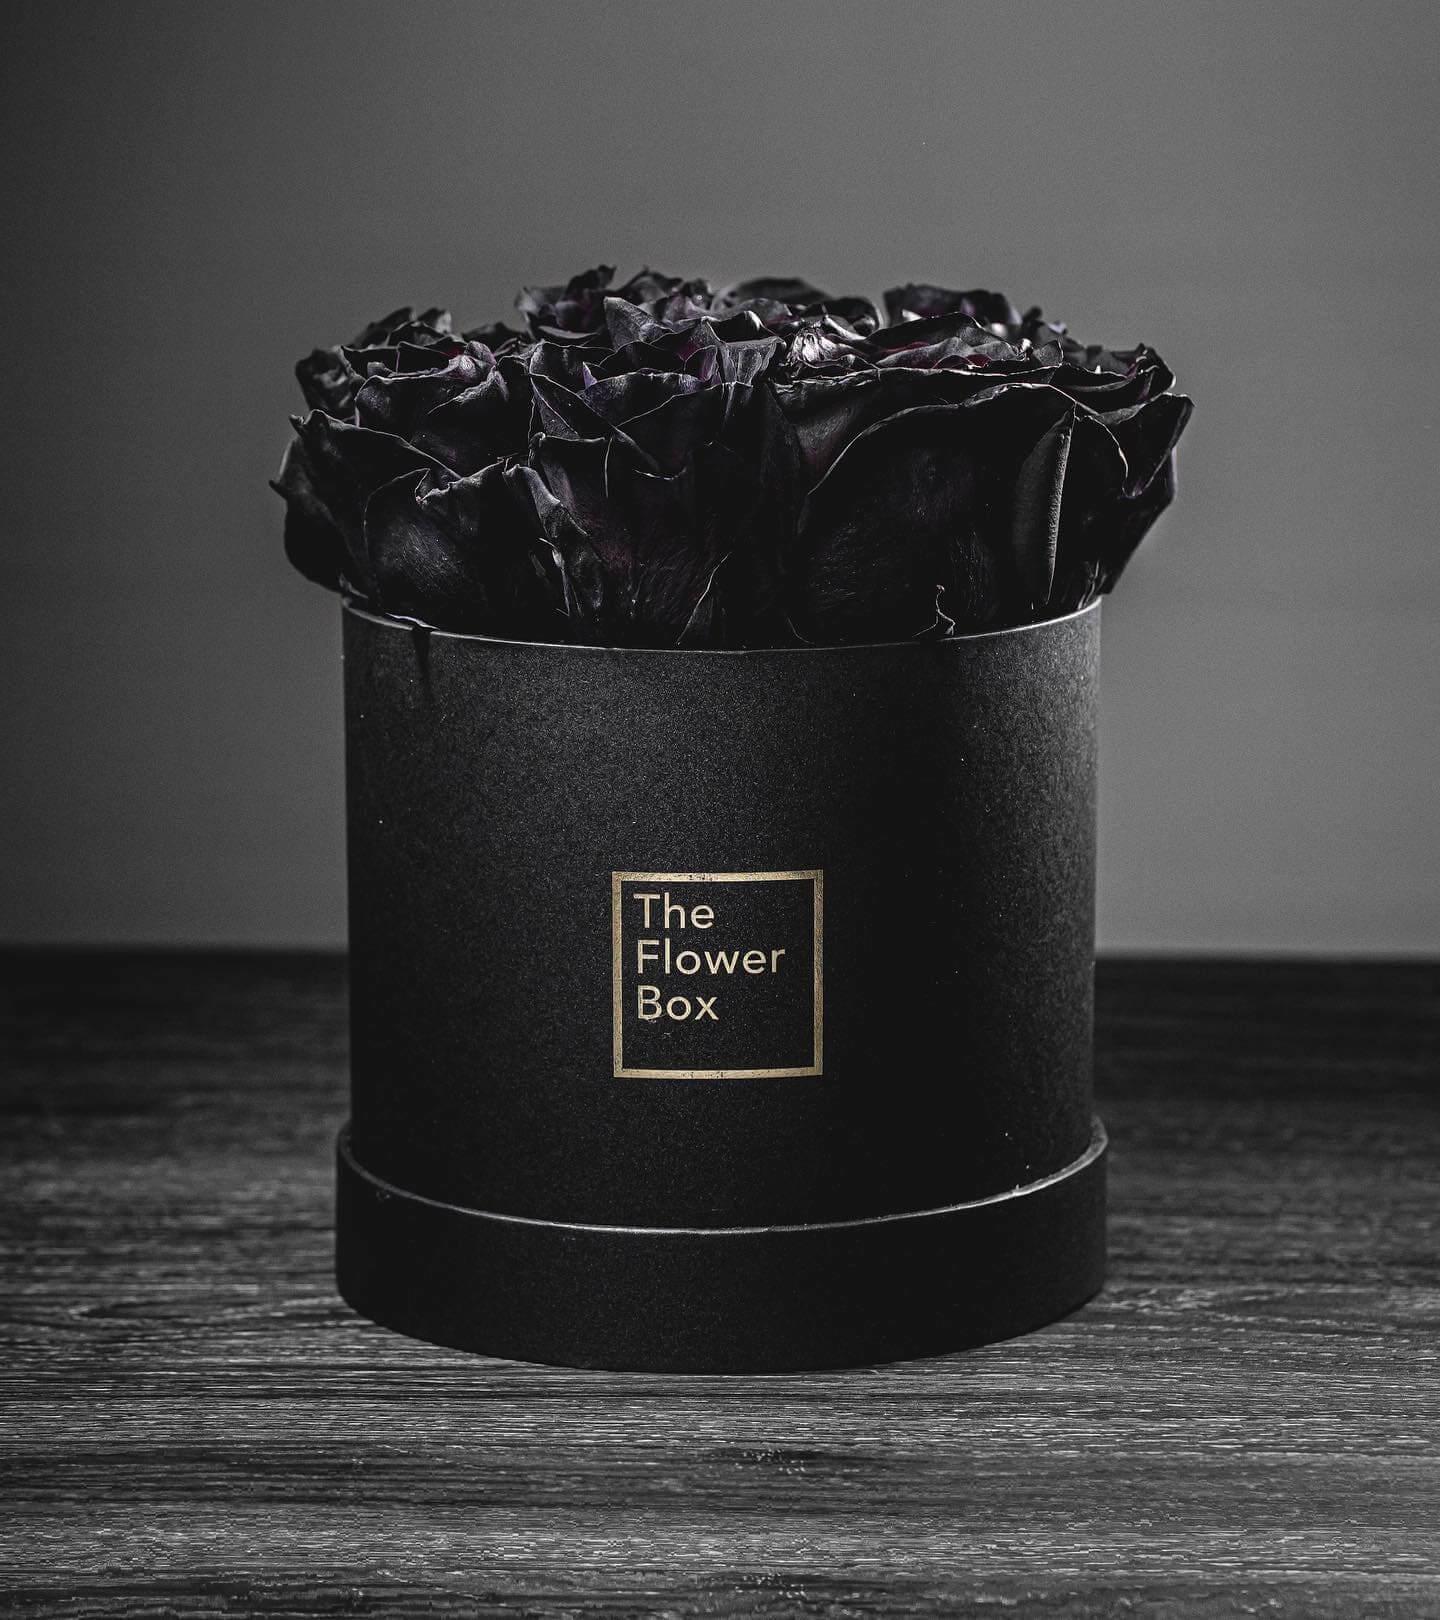 the-flower-box-01